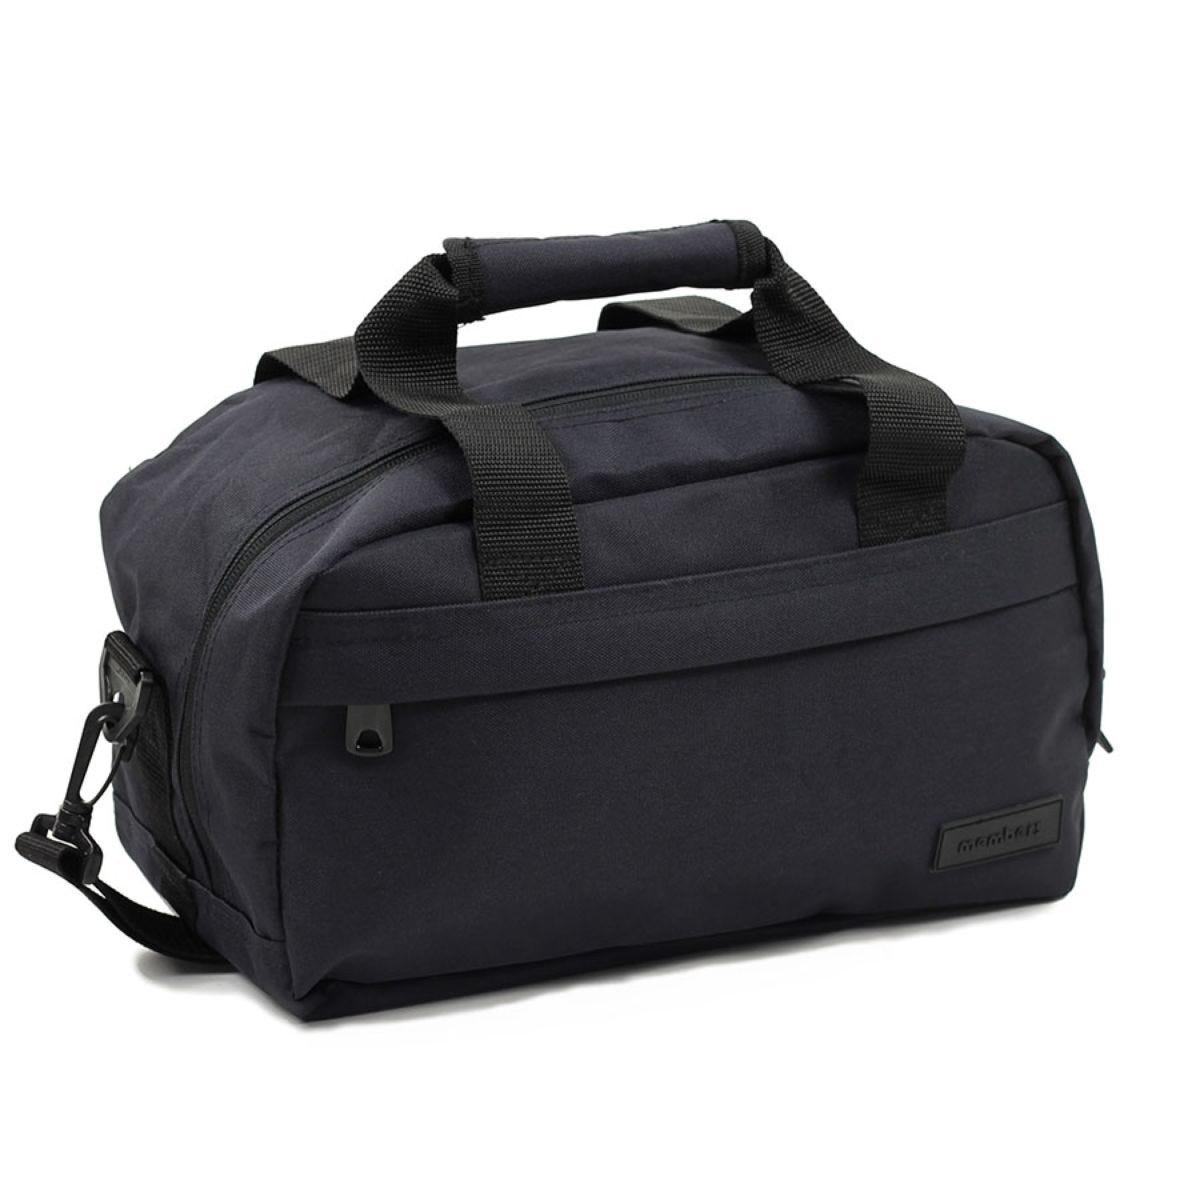 Members by Rock Luggage Essential Under-Seat Hand Luggage Bag – Black